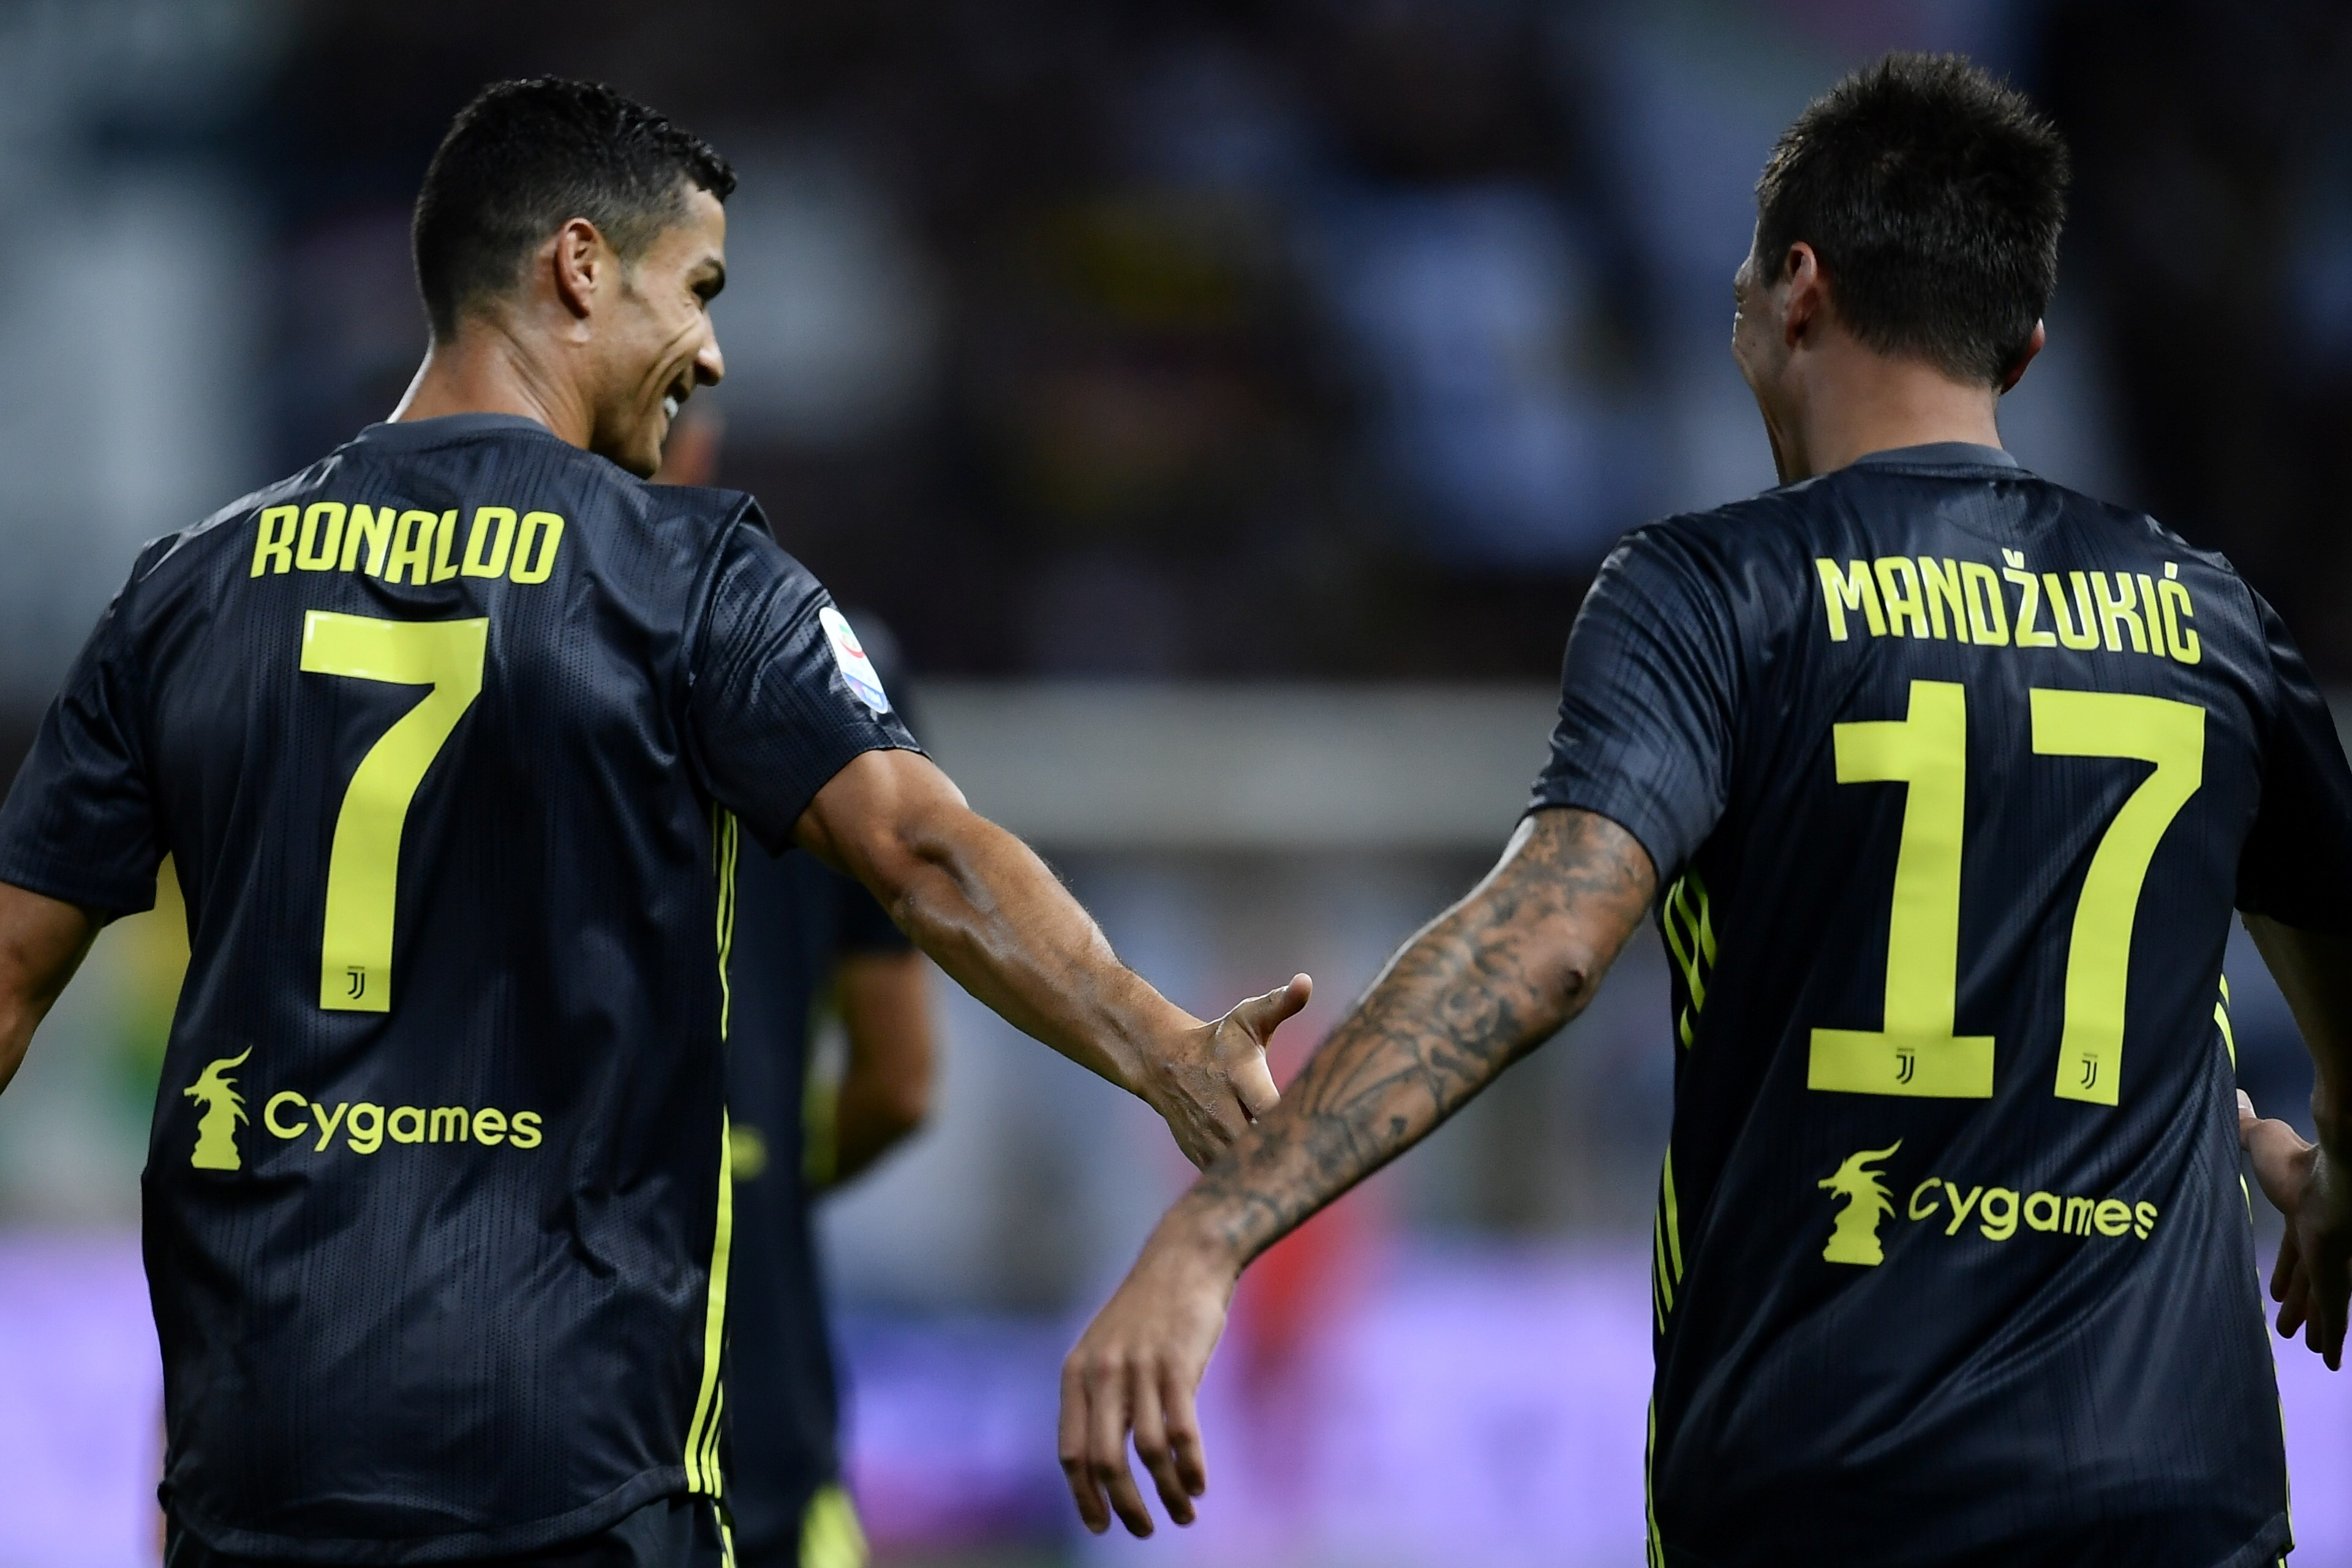 Cristiano Ronaldo et Mario Mandzukic lors de Parme - Juventus en Serie A 2018/2019